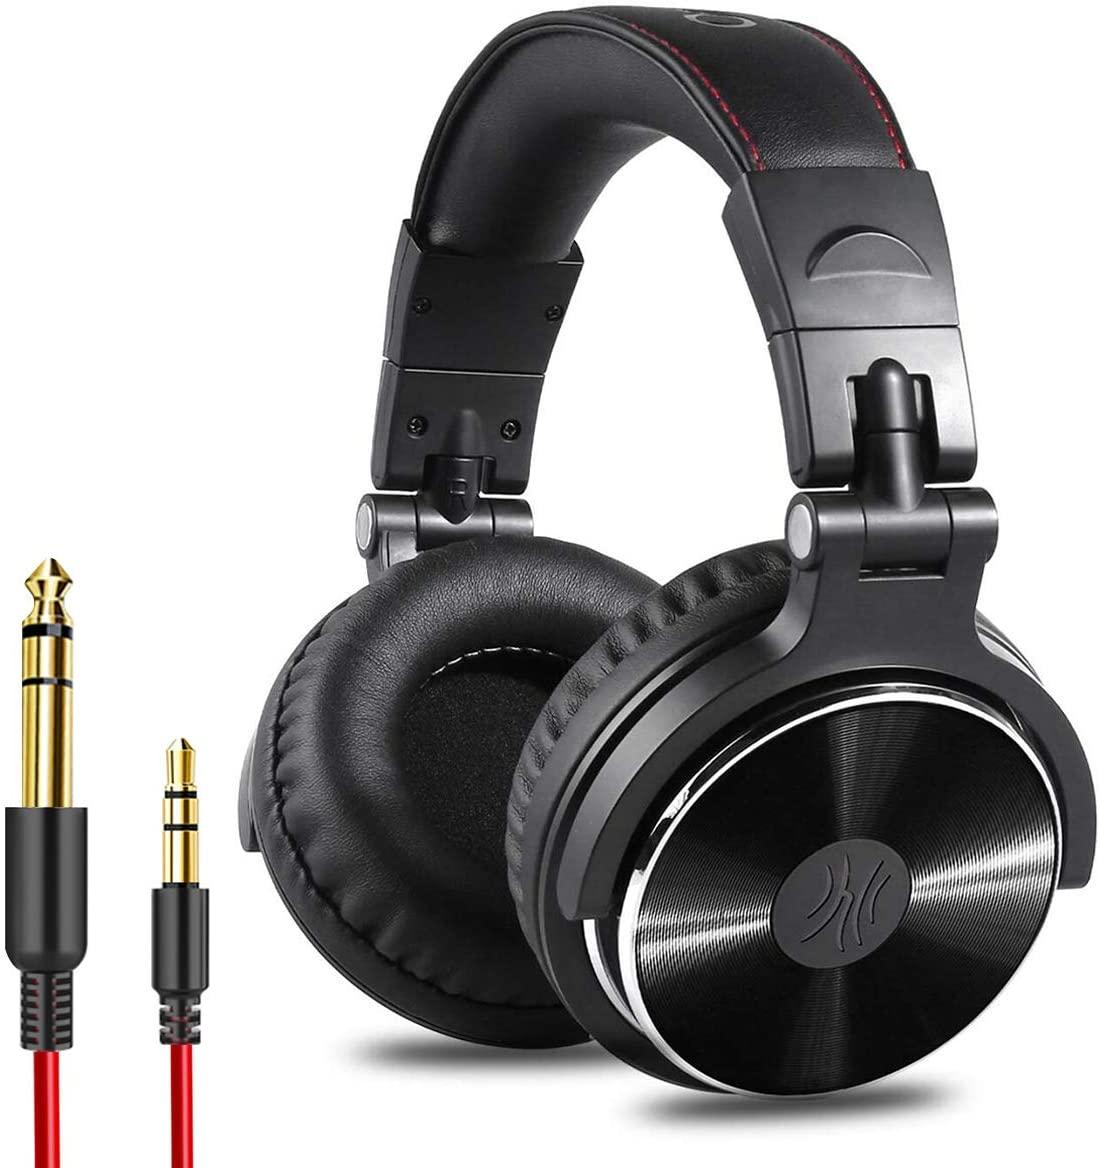 OneOdio Adapter-Free Headphones